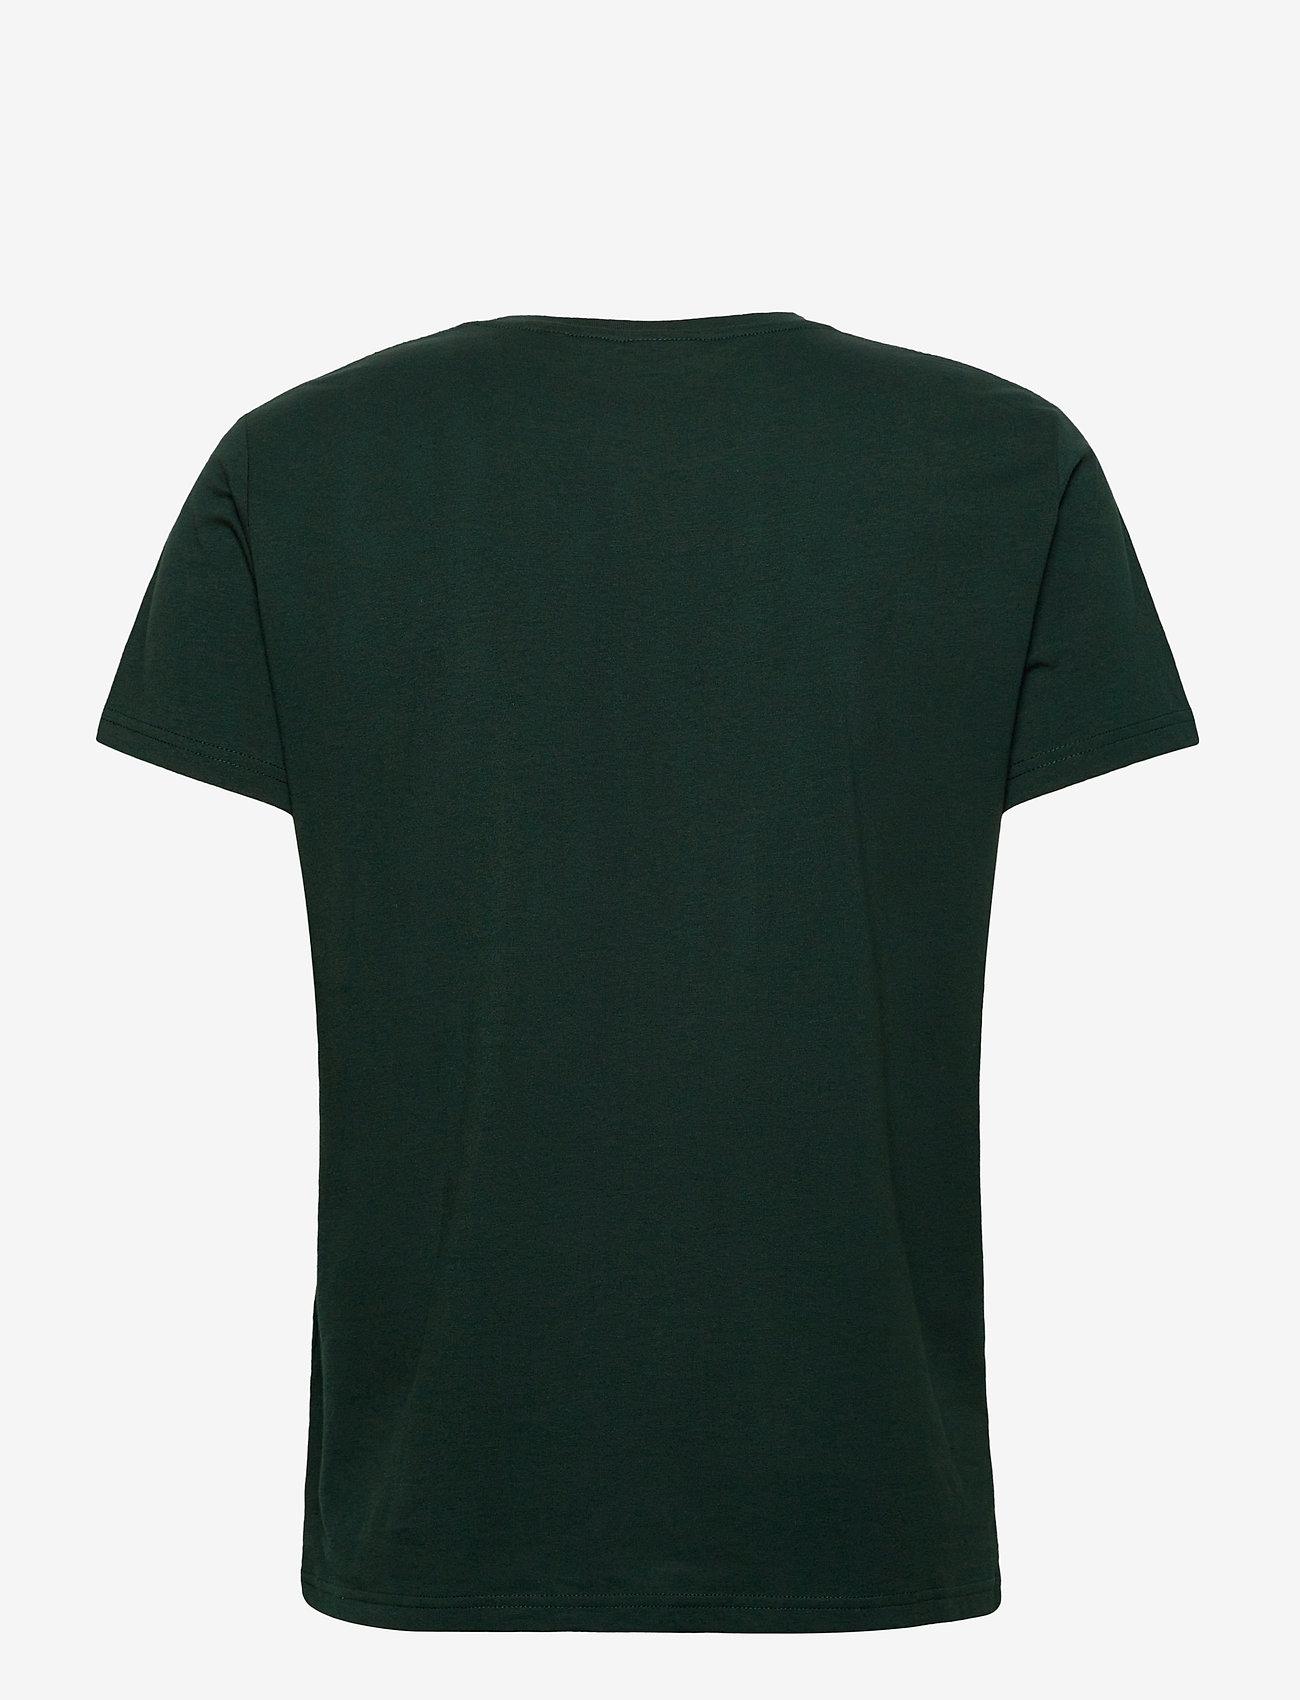 GANT - D1. MEDIUM SHIELD SS T-SHIRT - basic t-shirts - tartan green - 1